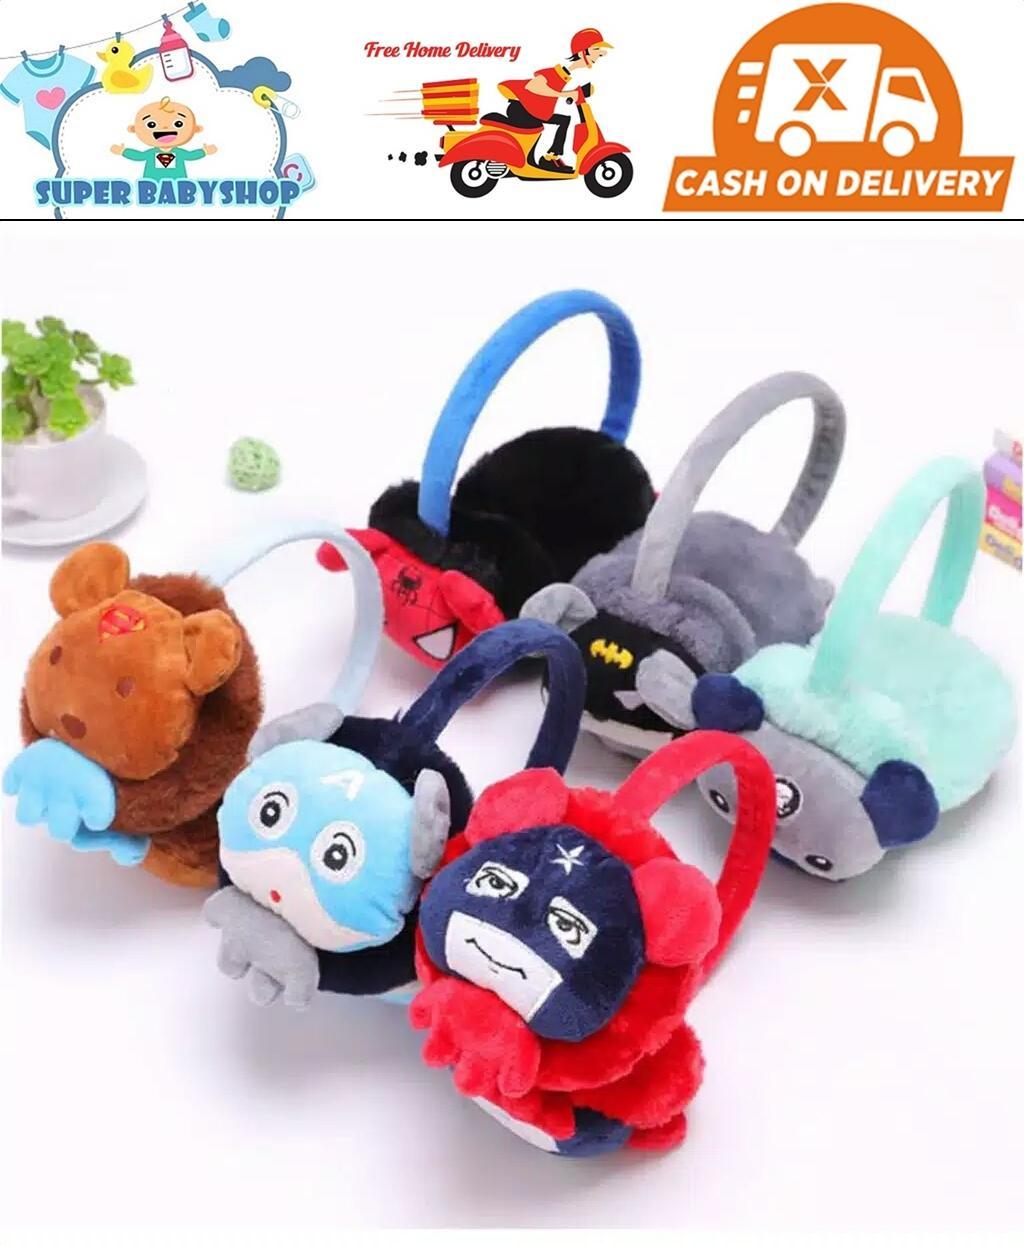 Earmuff Bayi Superhero 3d/penutup Telinga Bayi Atau Anak/earmuff Bayi Import By Super Babyshop.